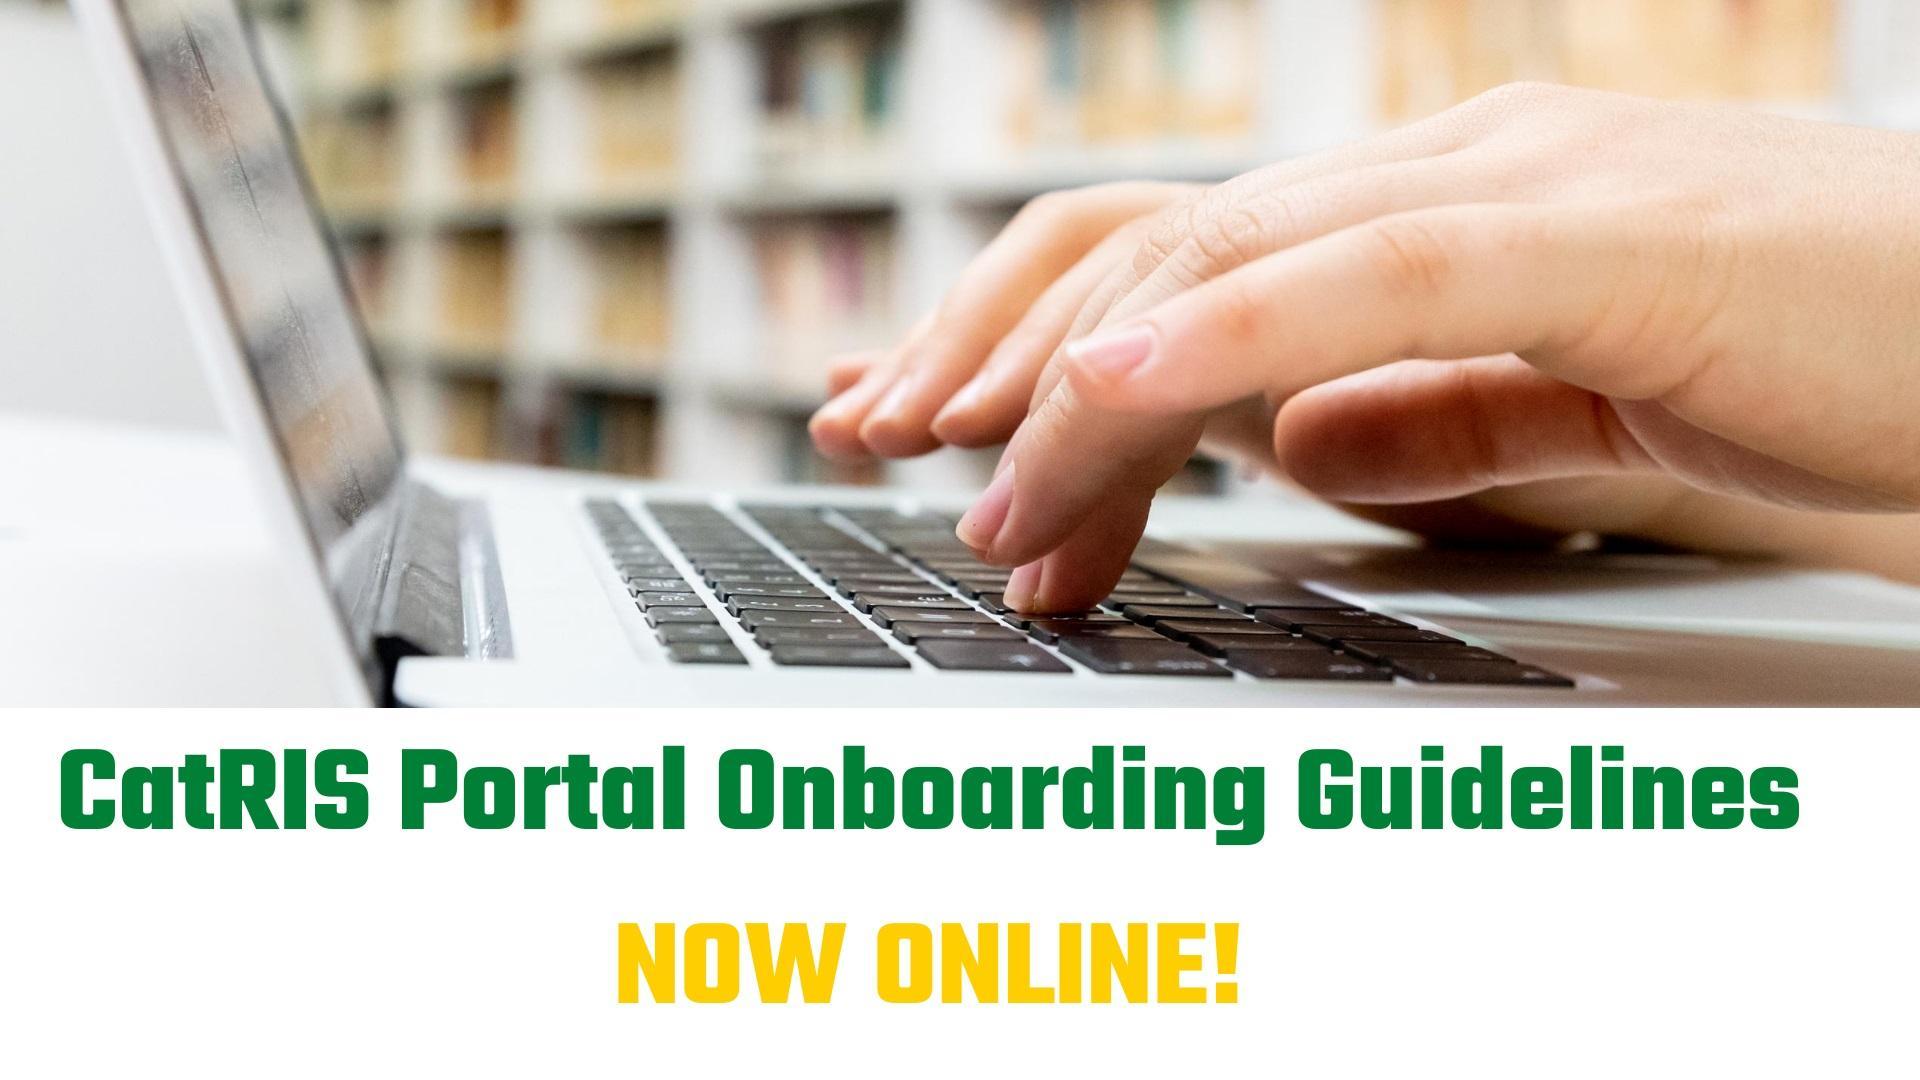 CatRIS Portal Onboarding Guidelines now online!